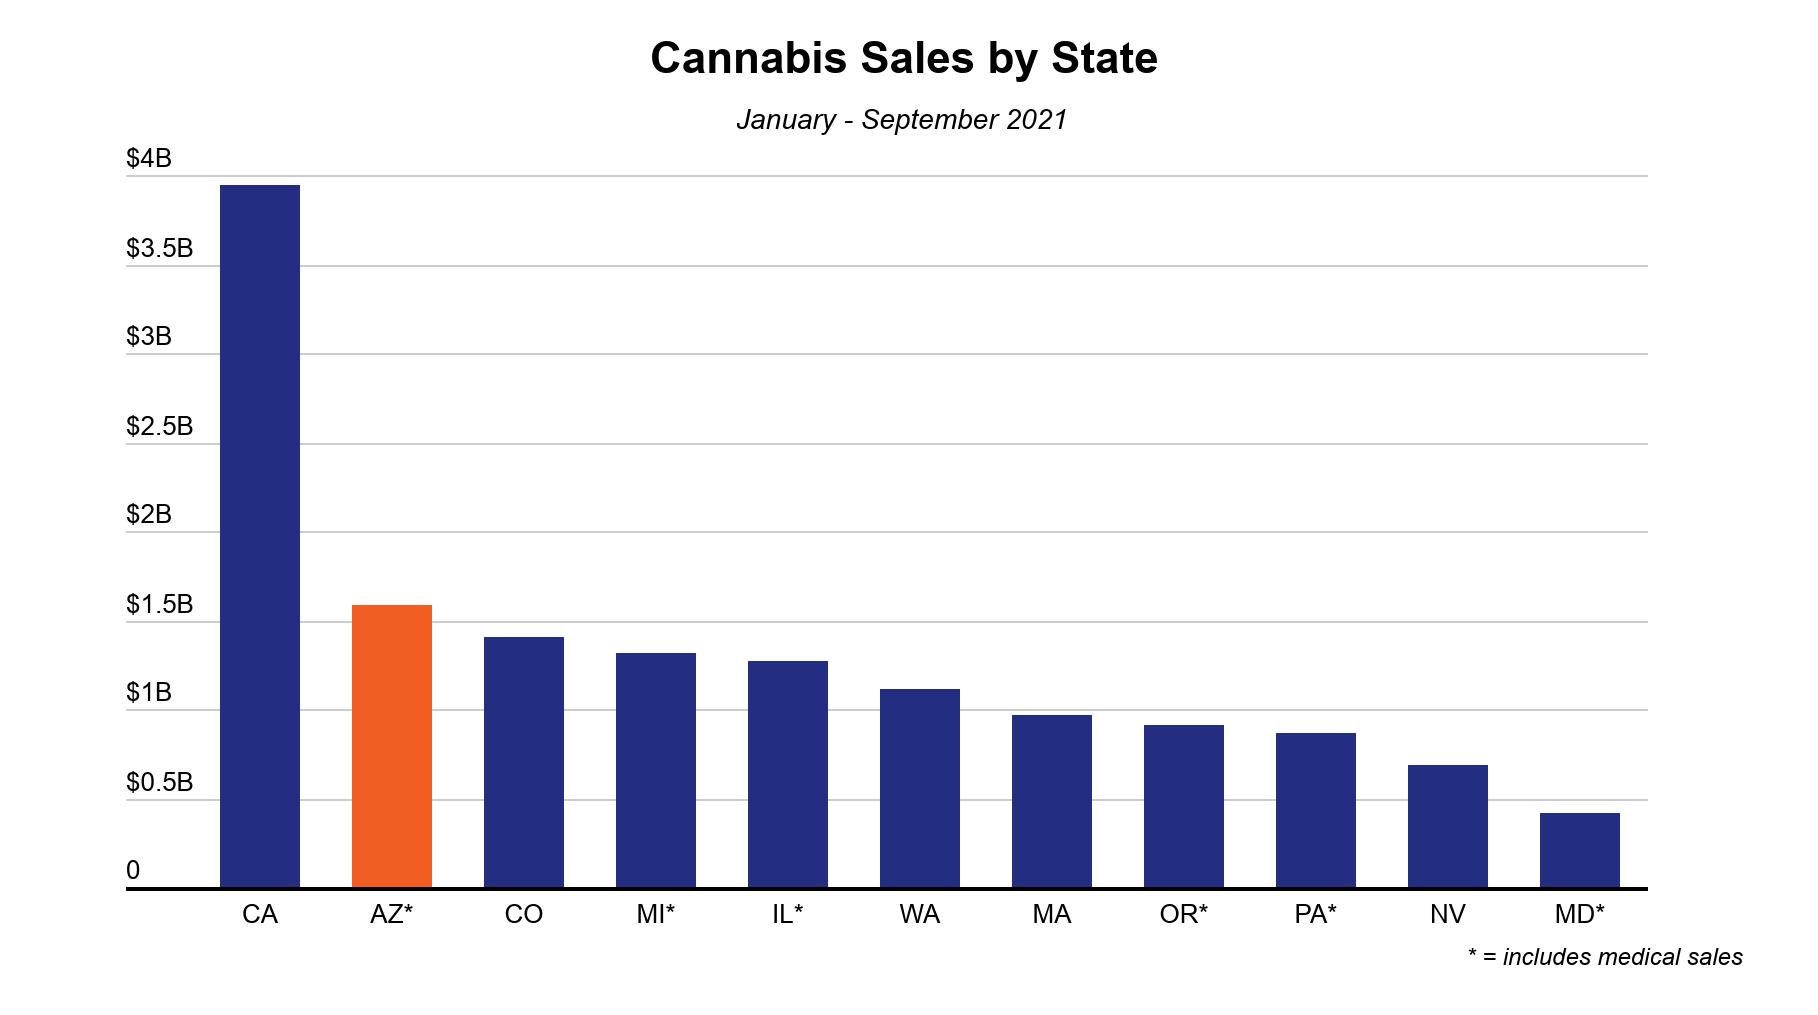 Arizona cannabis market report image 1: Total cannabis sales by US market